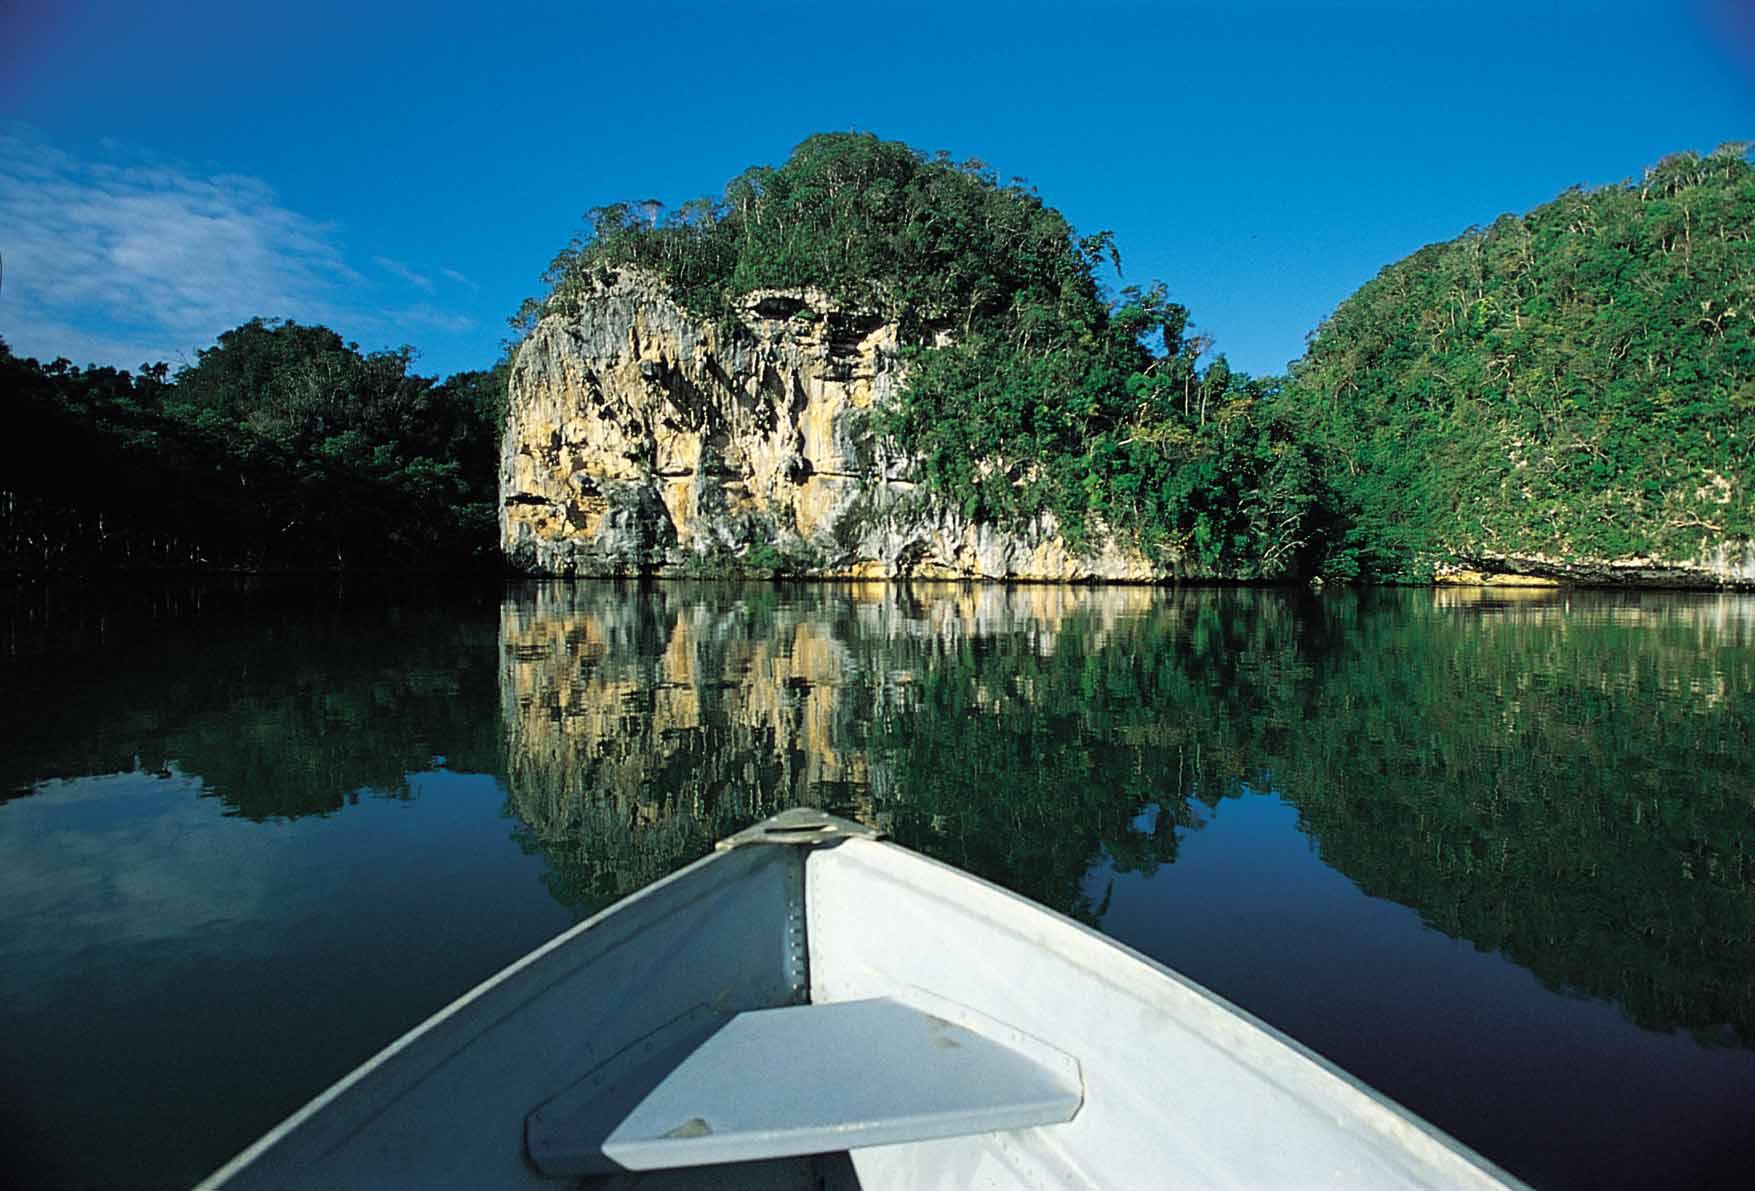 Los-Haitises-National-Park-lres1